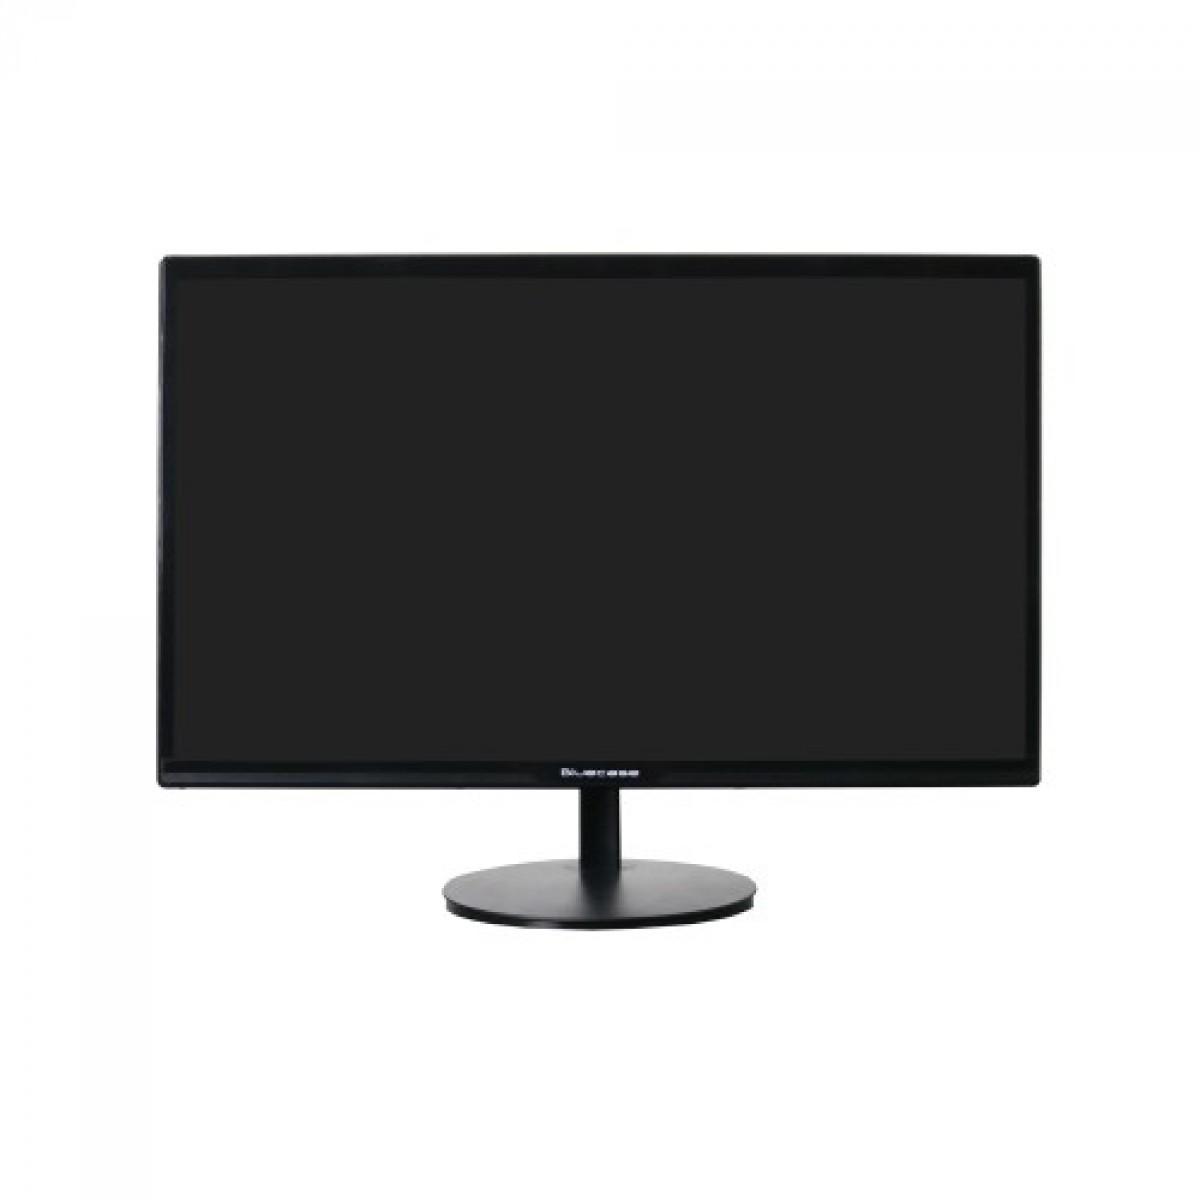 "Monitor Gamer BlueCase 24"", LED, VGA, HDMI, BM24X1CASE"